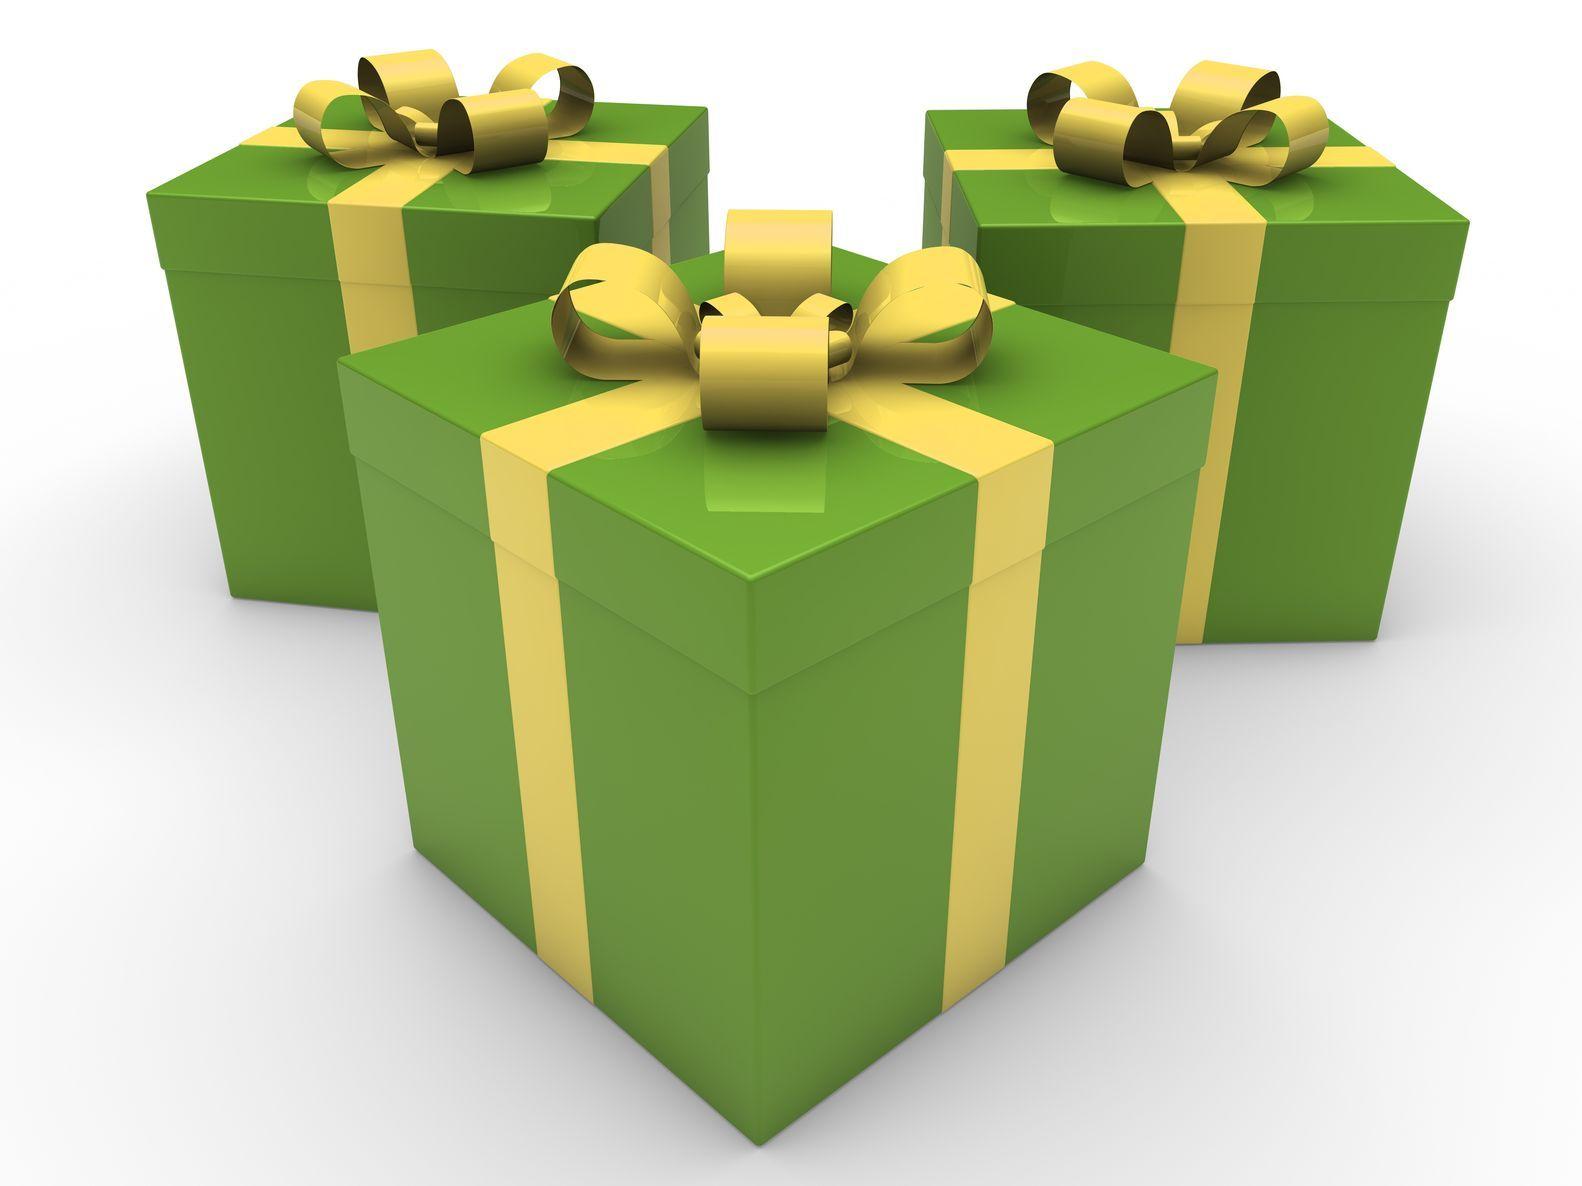 10559971_ml present